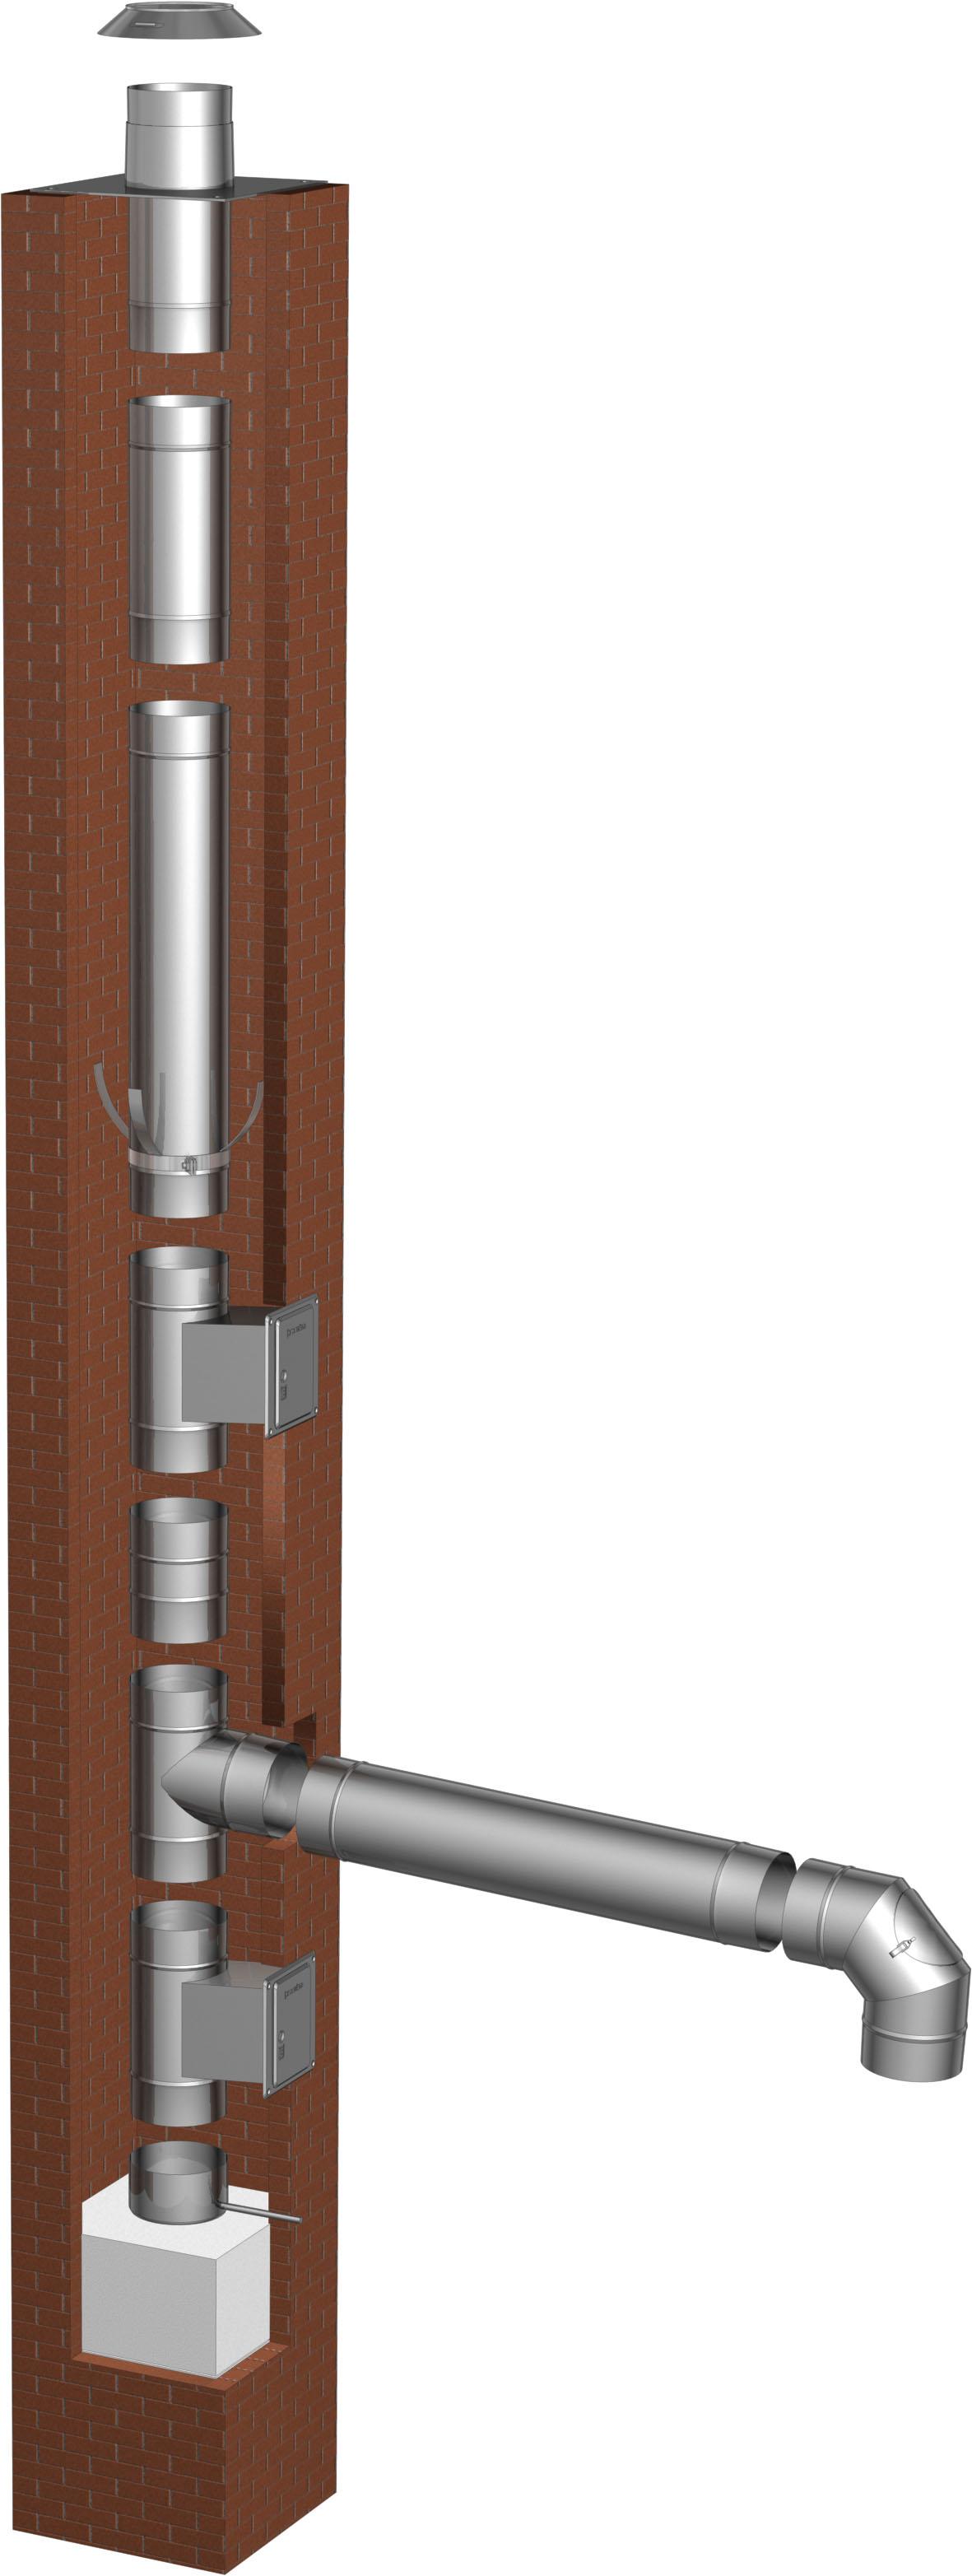 Schornsteinsanierung einwandig Ø 120 mm – Tecnovis TEC-EW-Classic